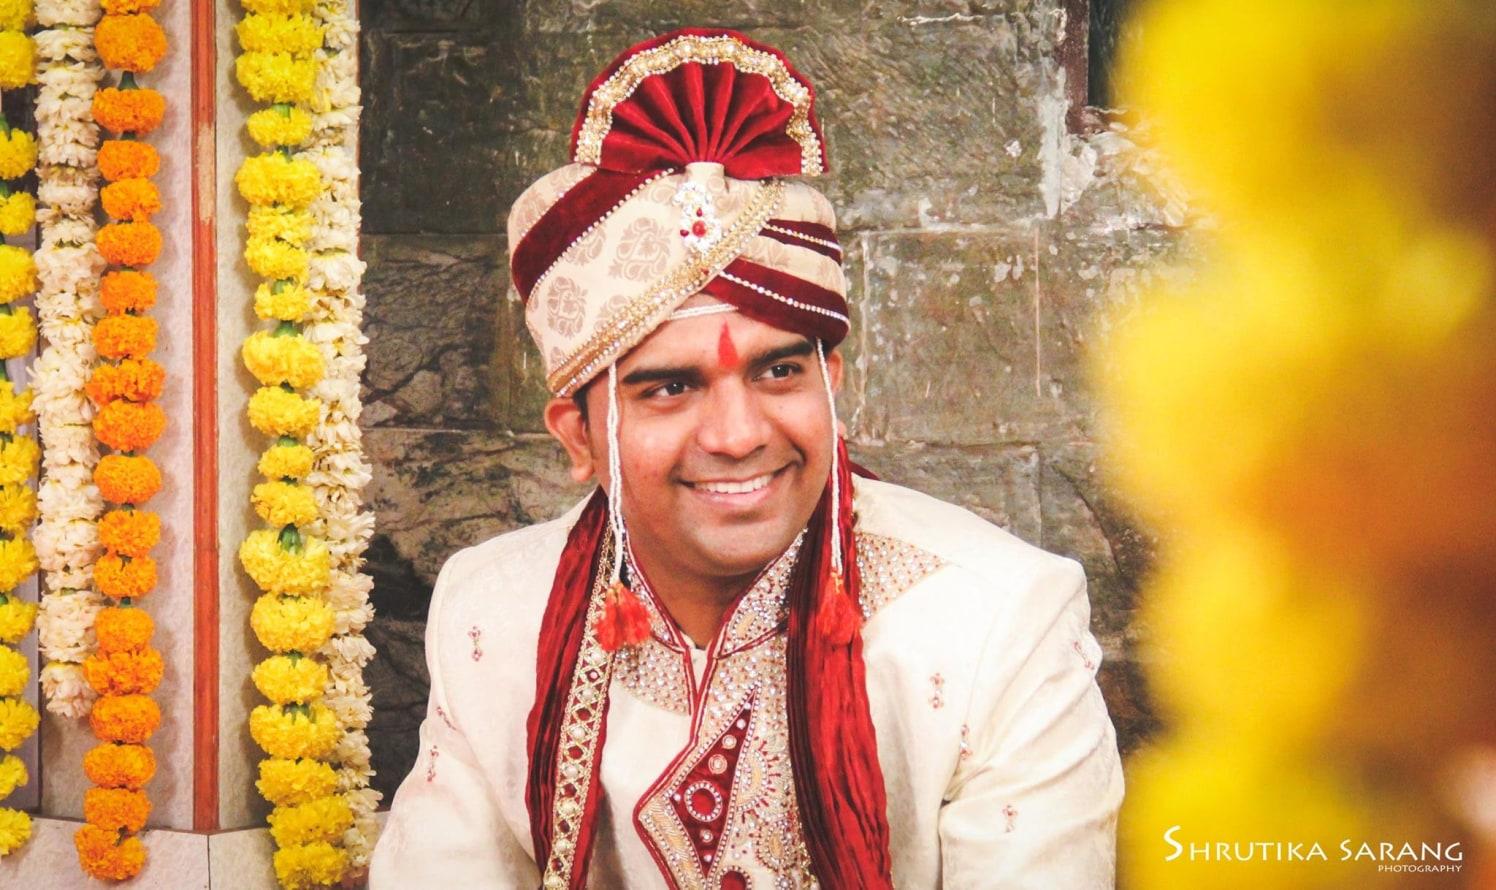 Cheekiest by Shrutika Sarang Photography Wedding-photography | Weddings Photos & Ideas